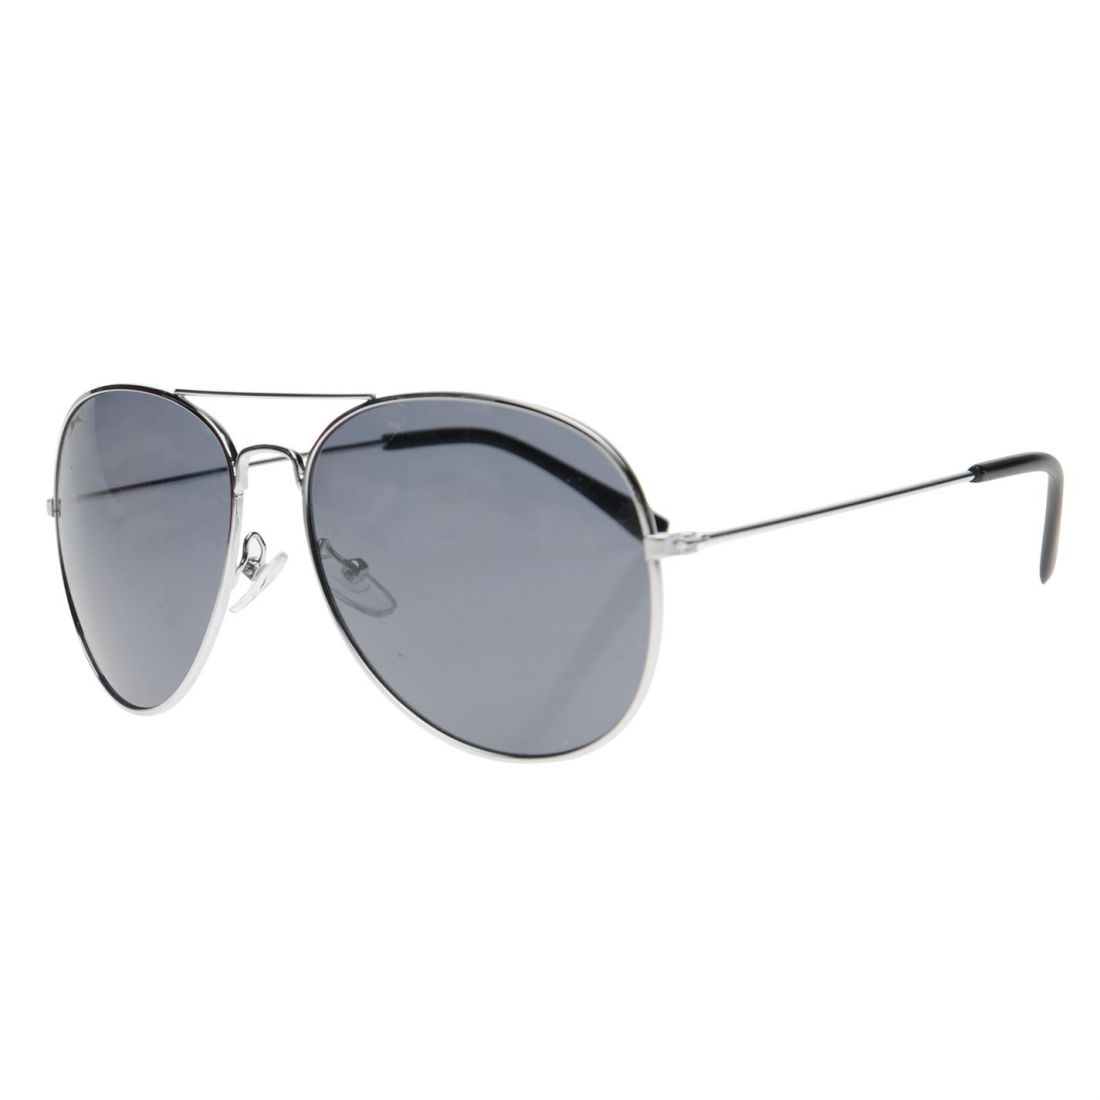 b5b2e7ab5 Slazenger Sunglasses Mens Gents 5057816191571   eBay